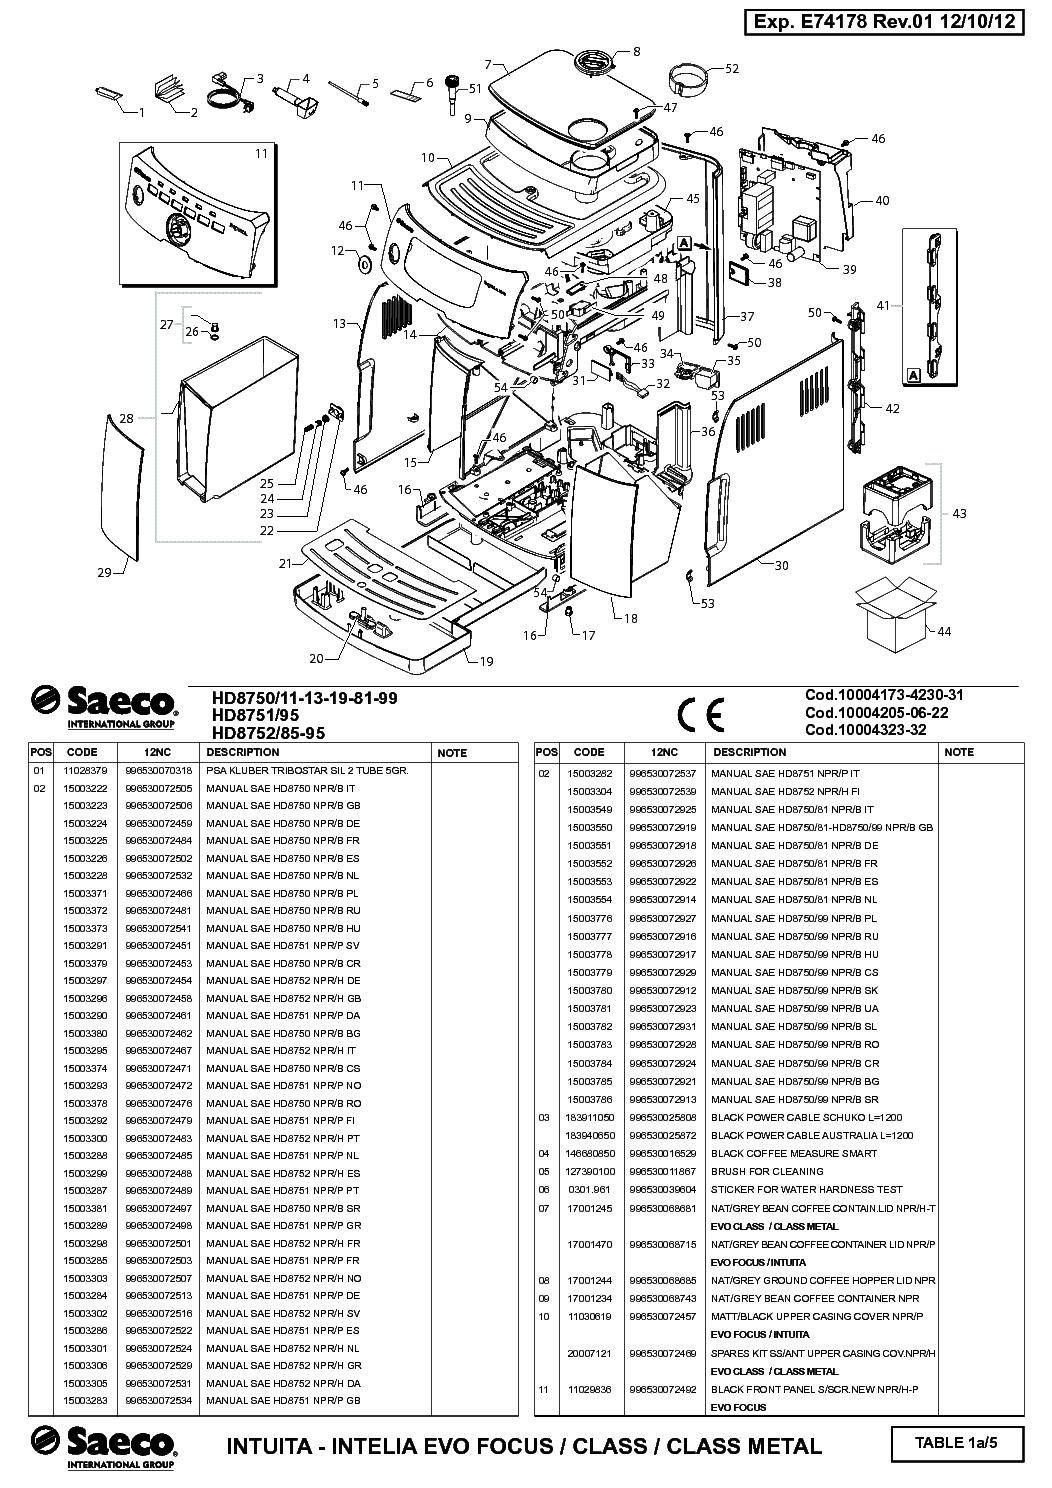 philips saeco hd8750 hd8751 hd8752 espresso maker service manual rh elektrotanya com Maintenance Man Service Manuals